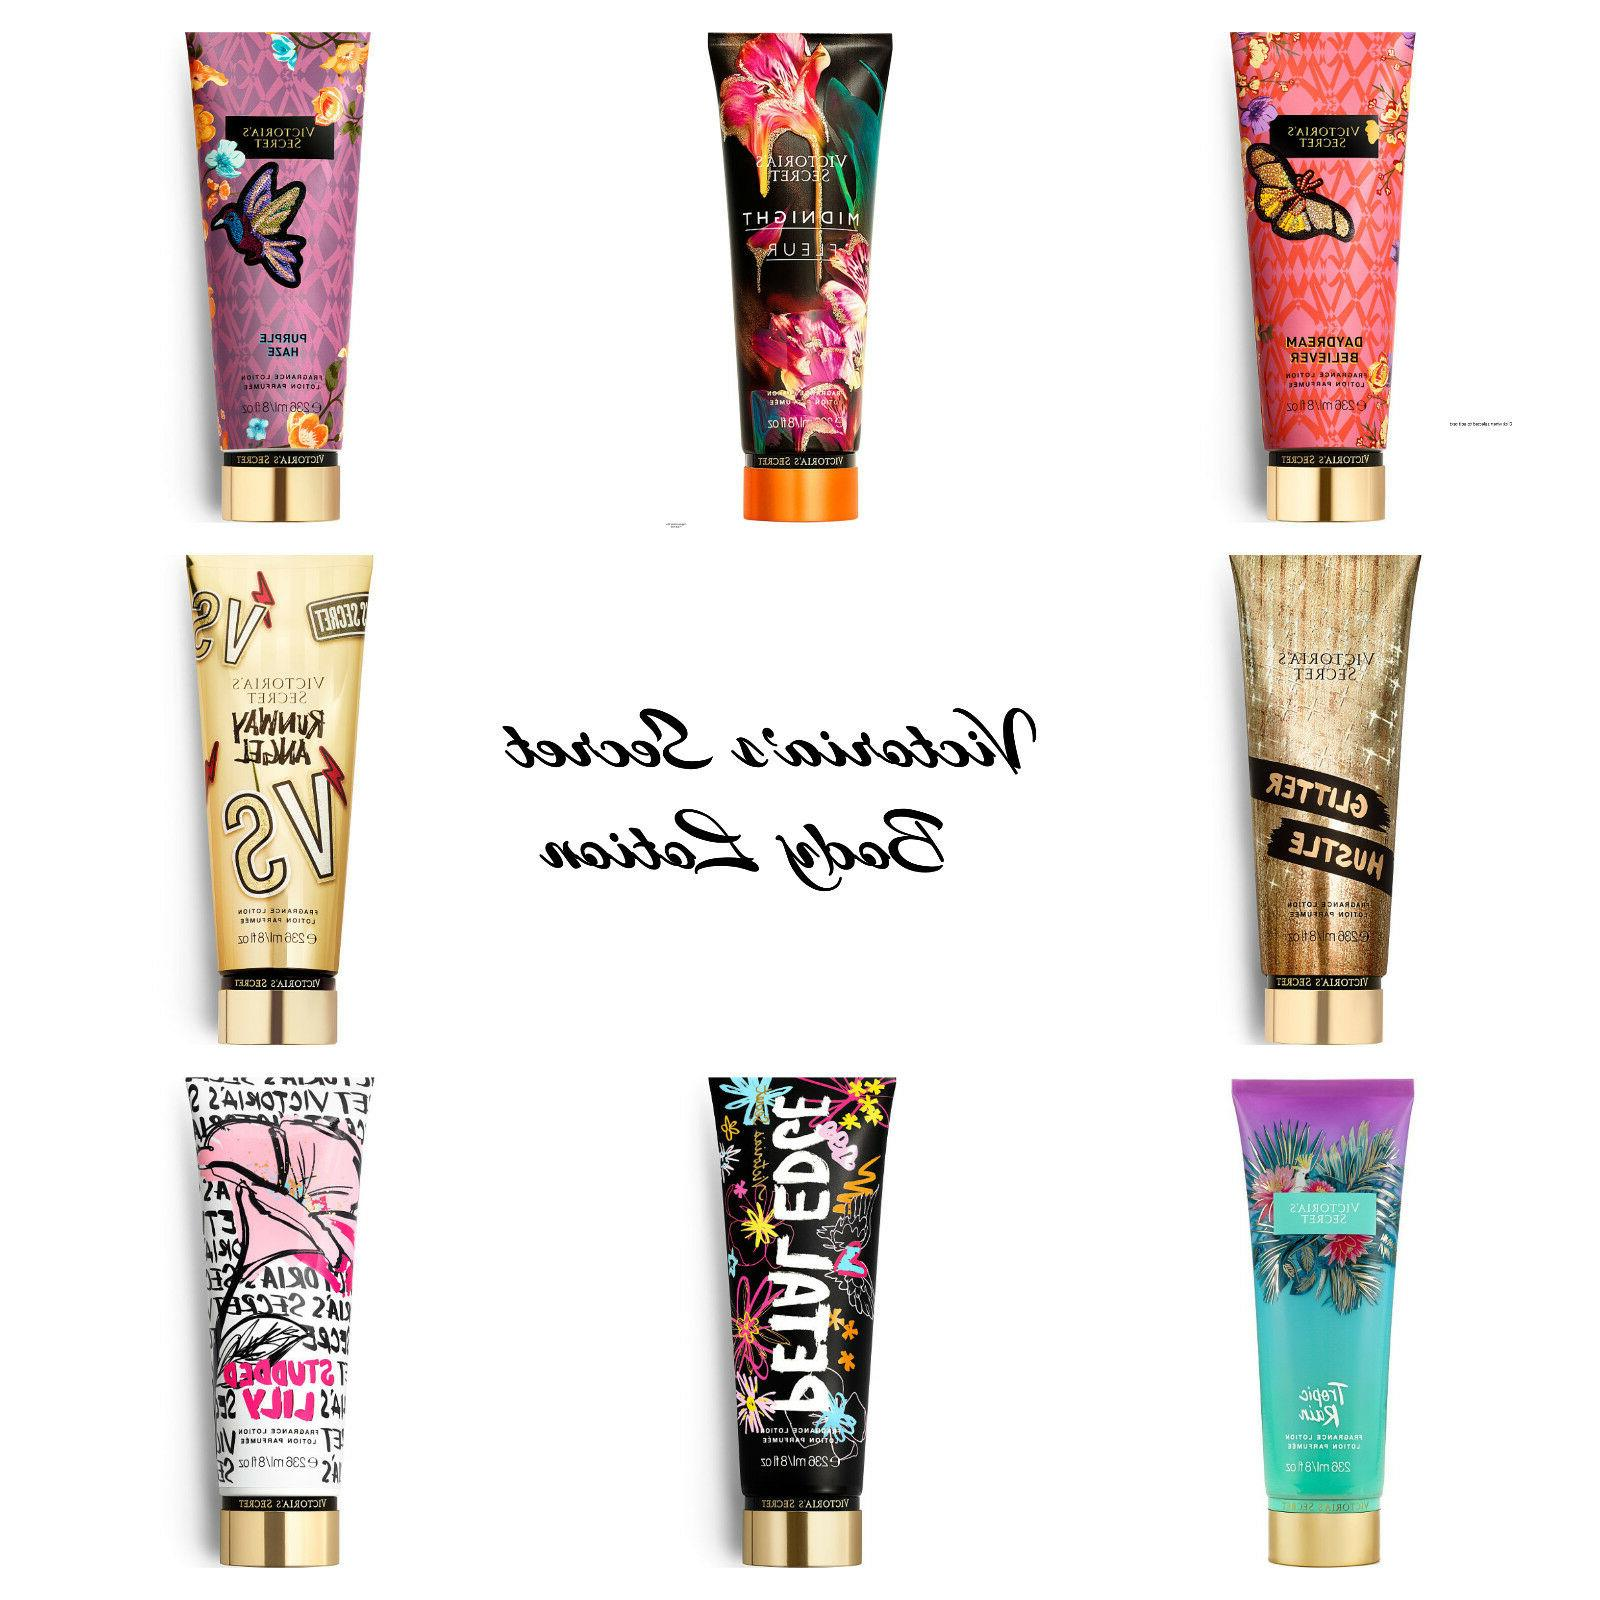 New Authentic-Victoria's Secret-Fragrance Body Lotion 8oz Li